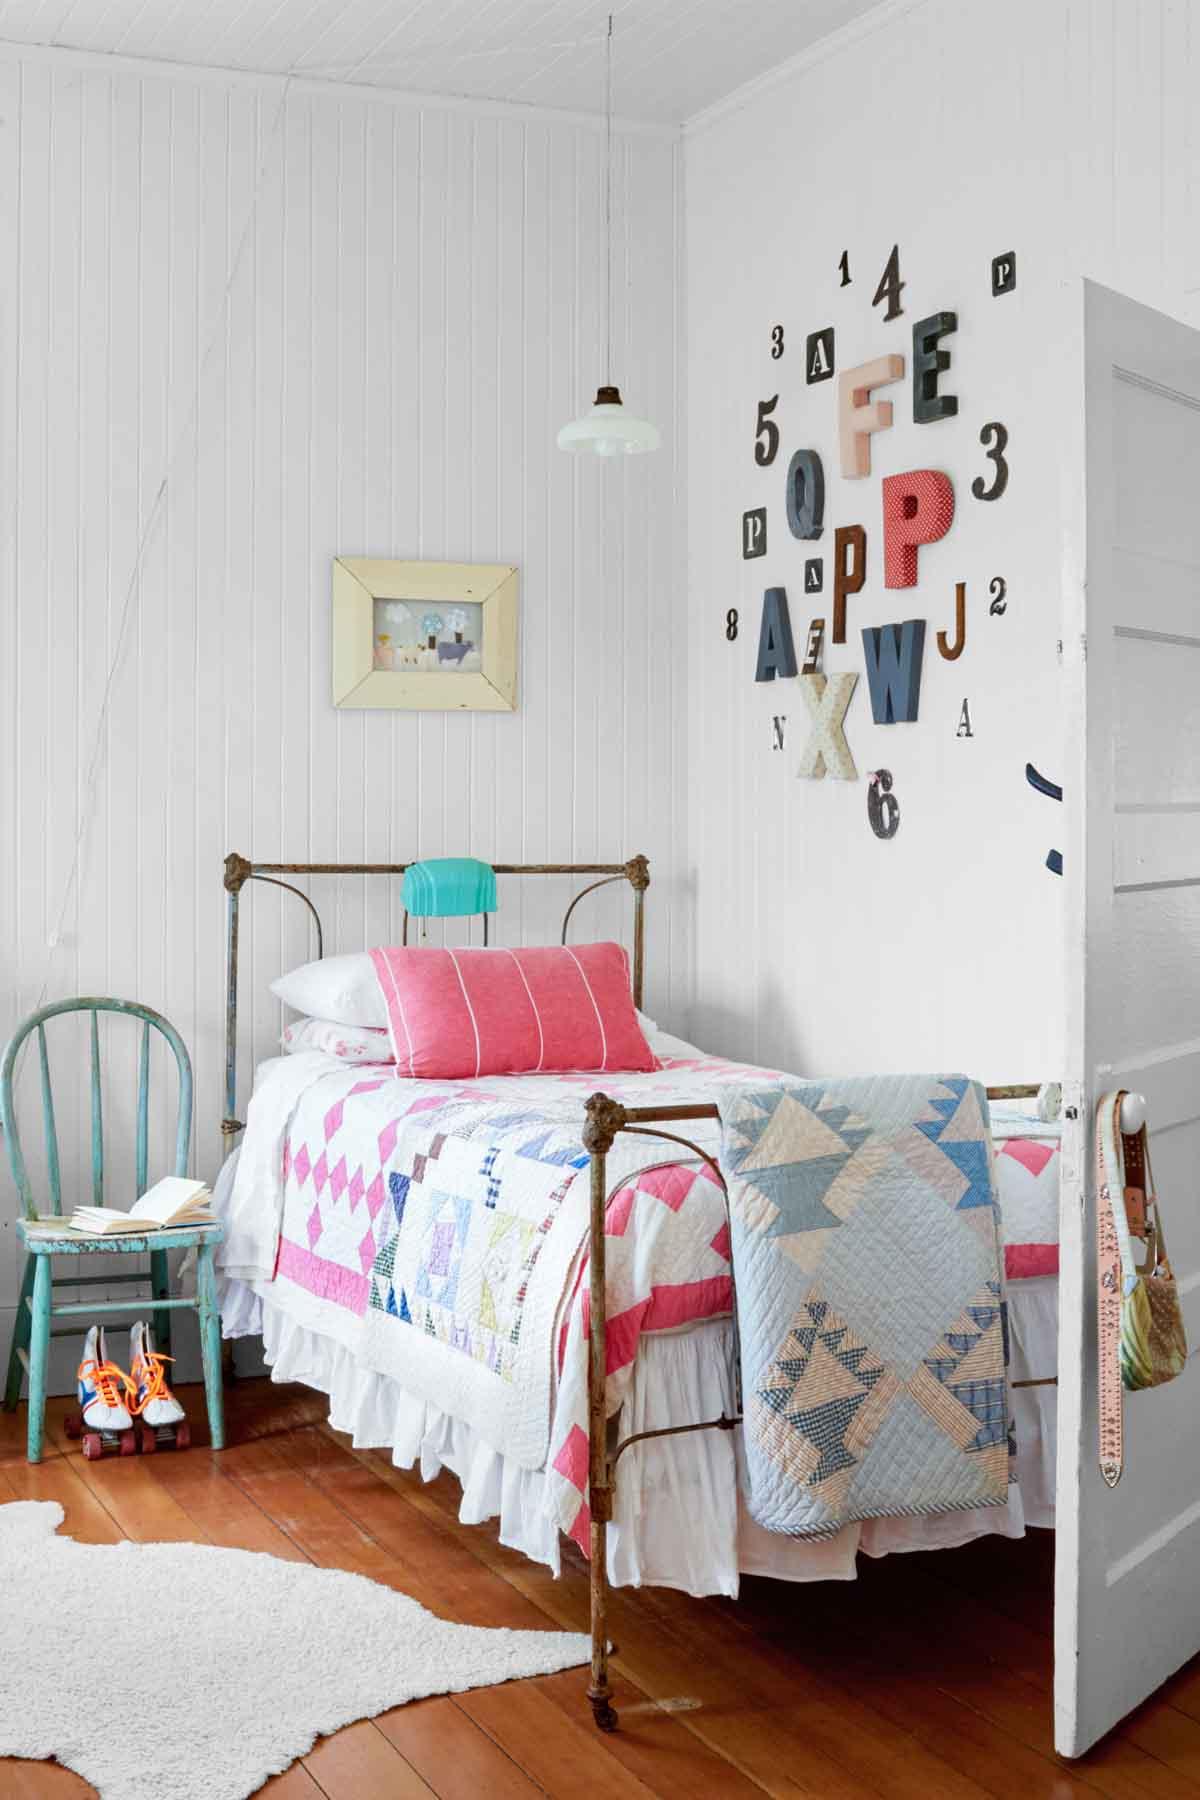 12 Fun Girl's Bedroom Decor Ideas - Cute Room Decorating ...